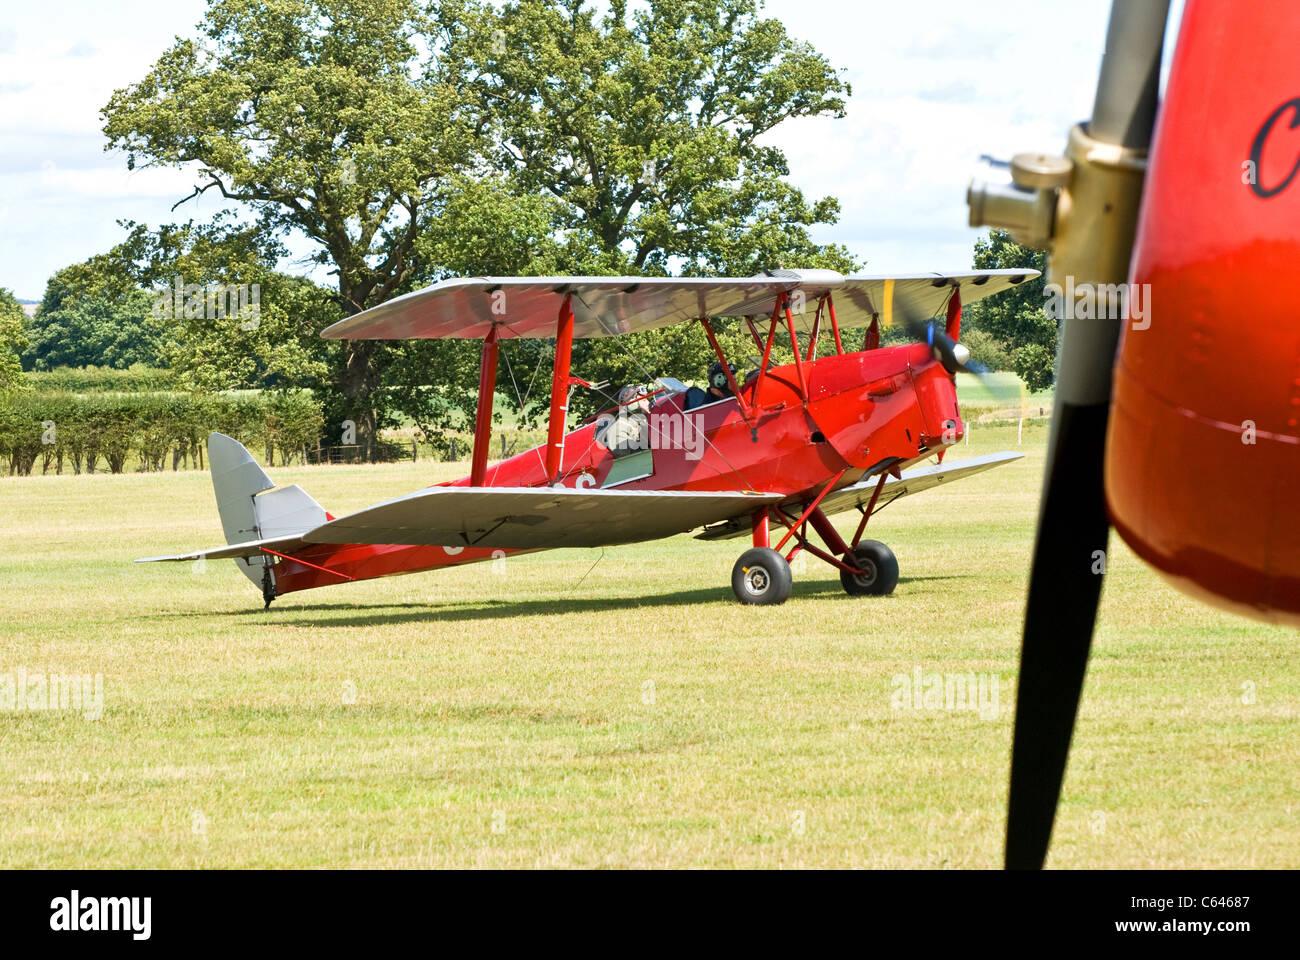 Tiger Moth bi-plane - Stock Image